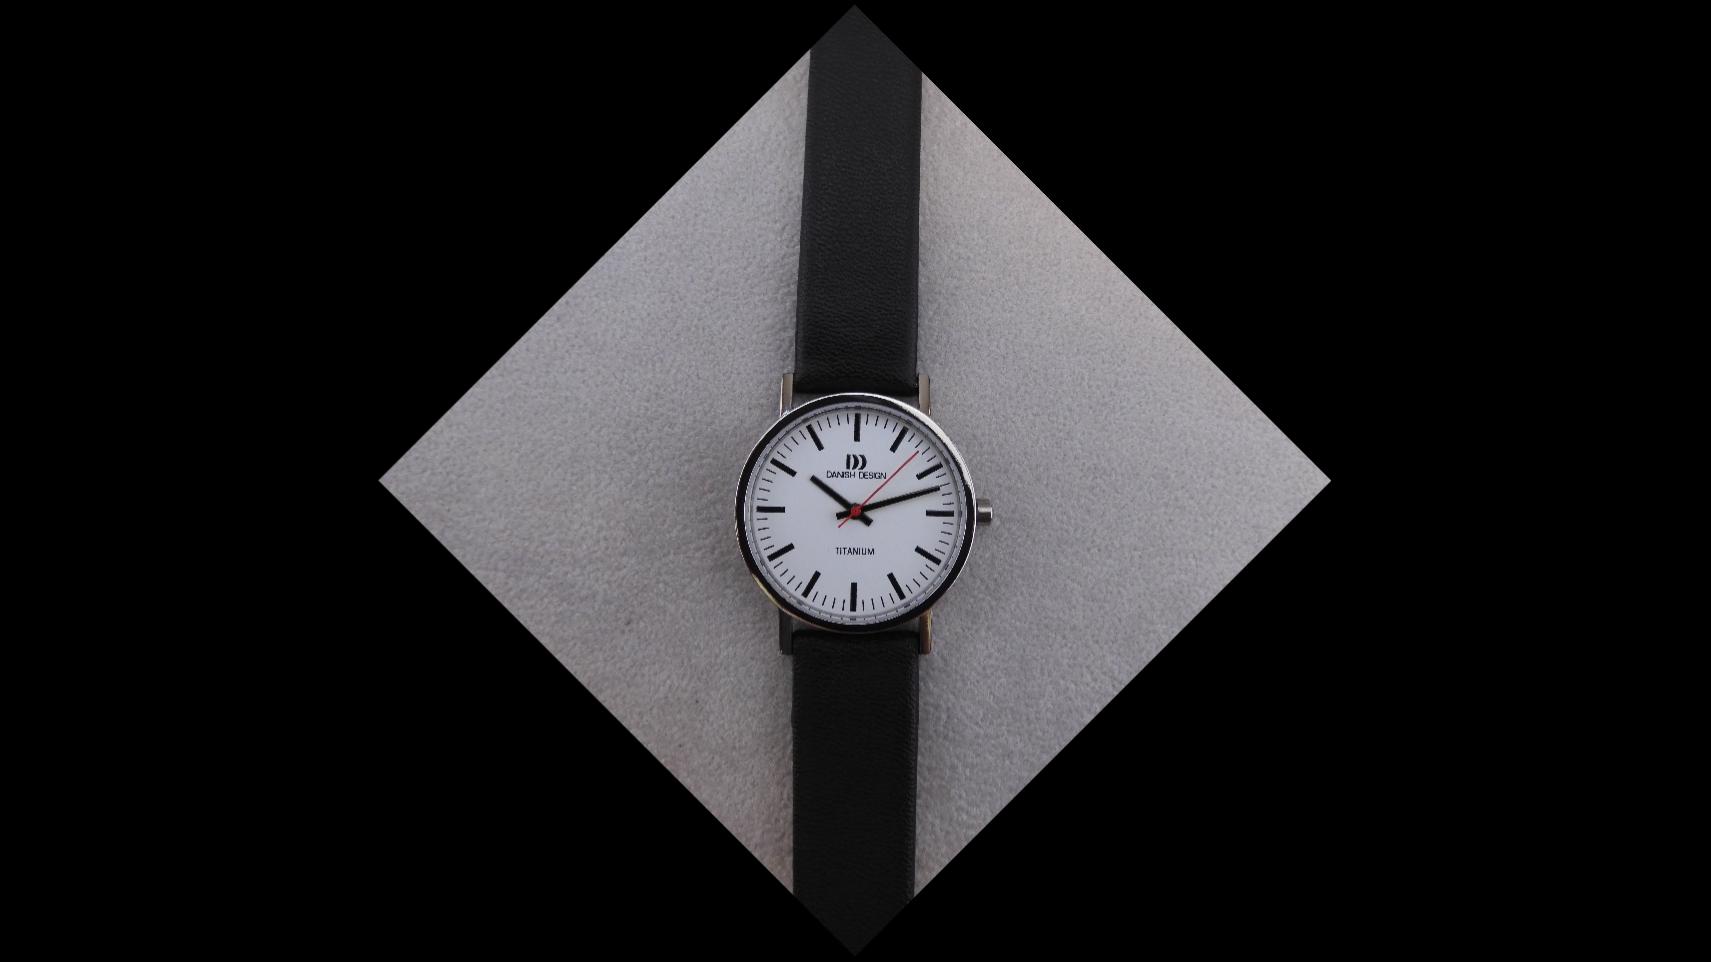 Uhr13